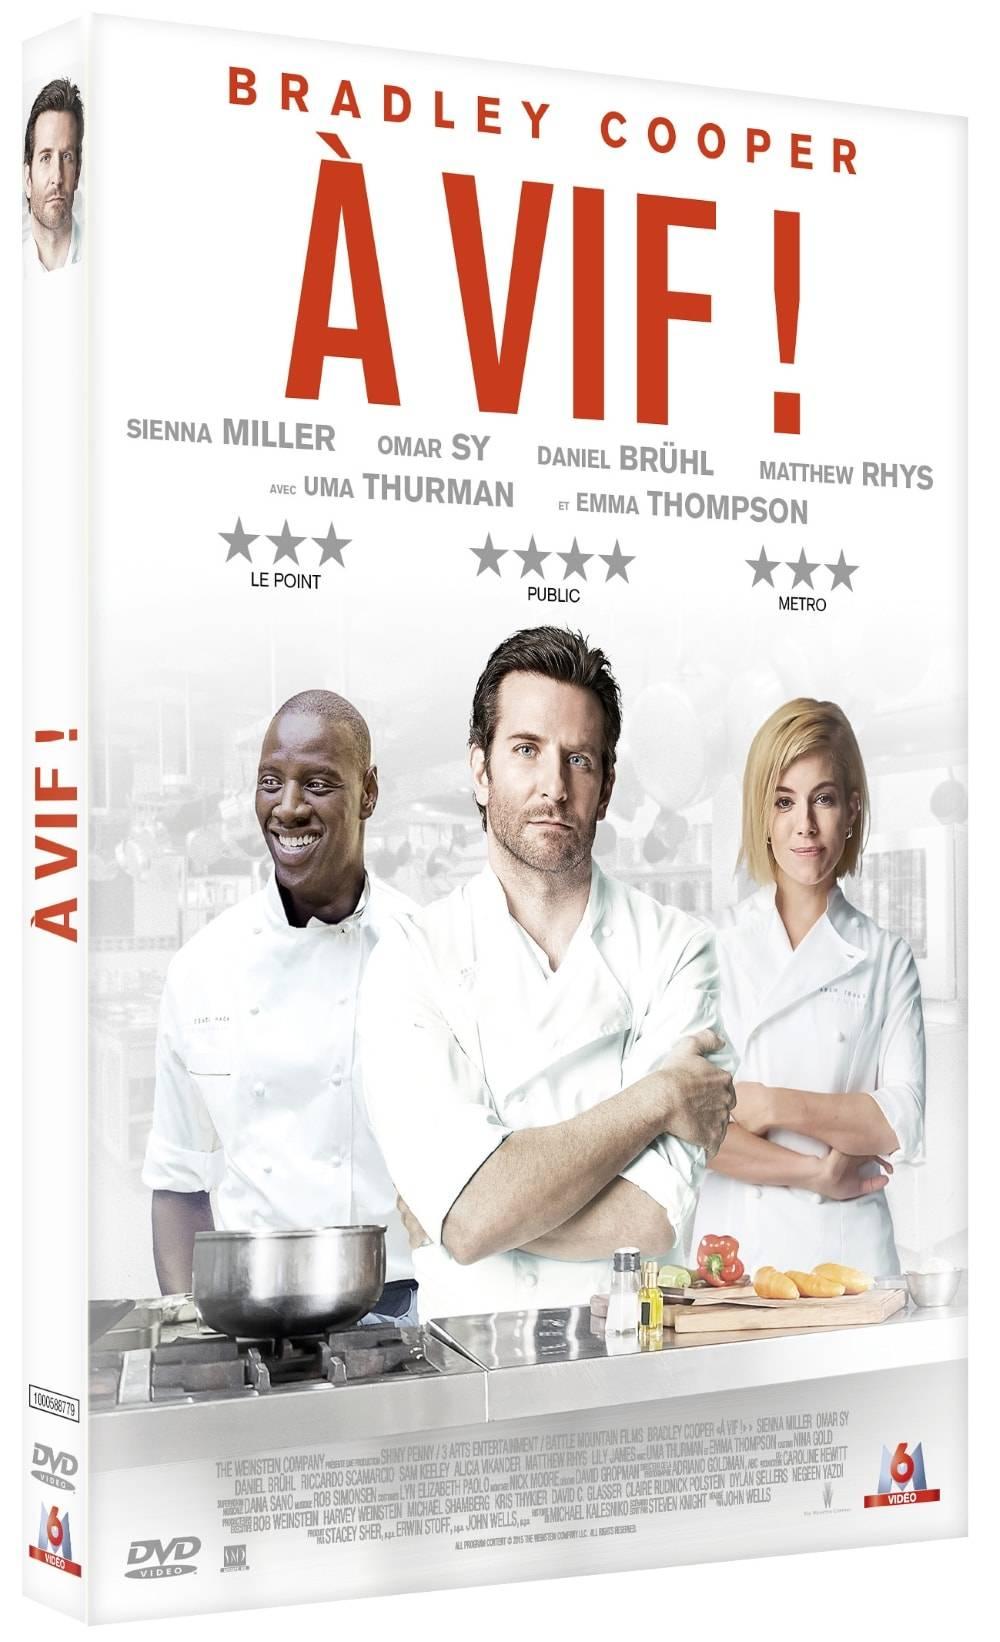 DVD_A vif film Bradley Cooper